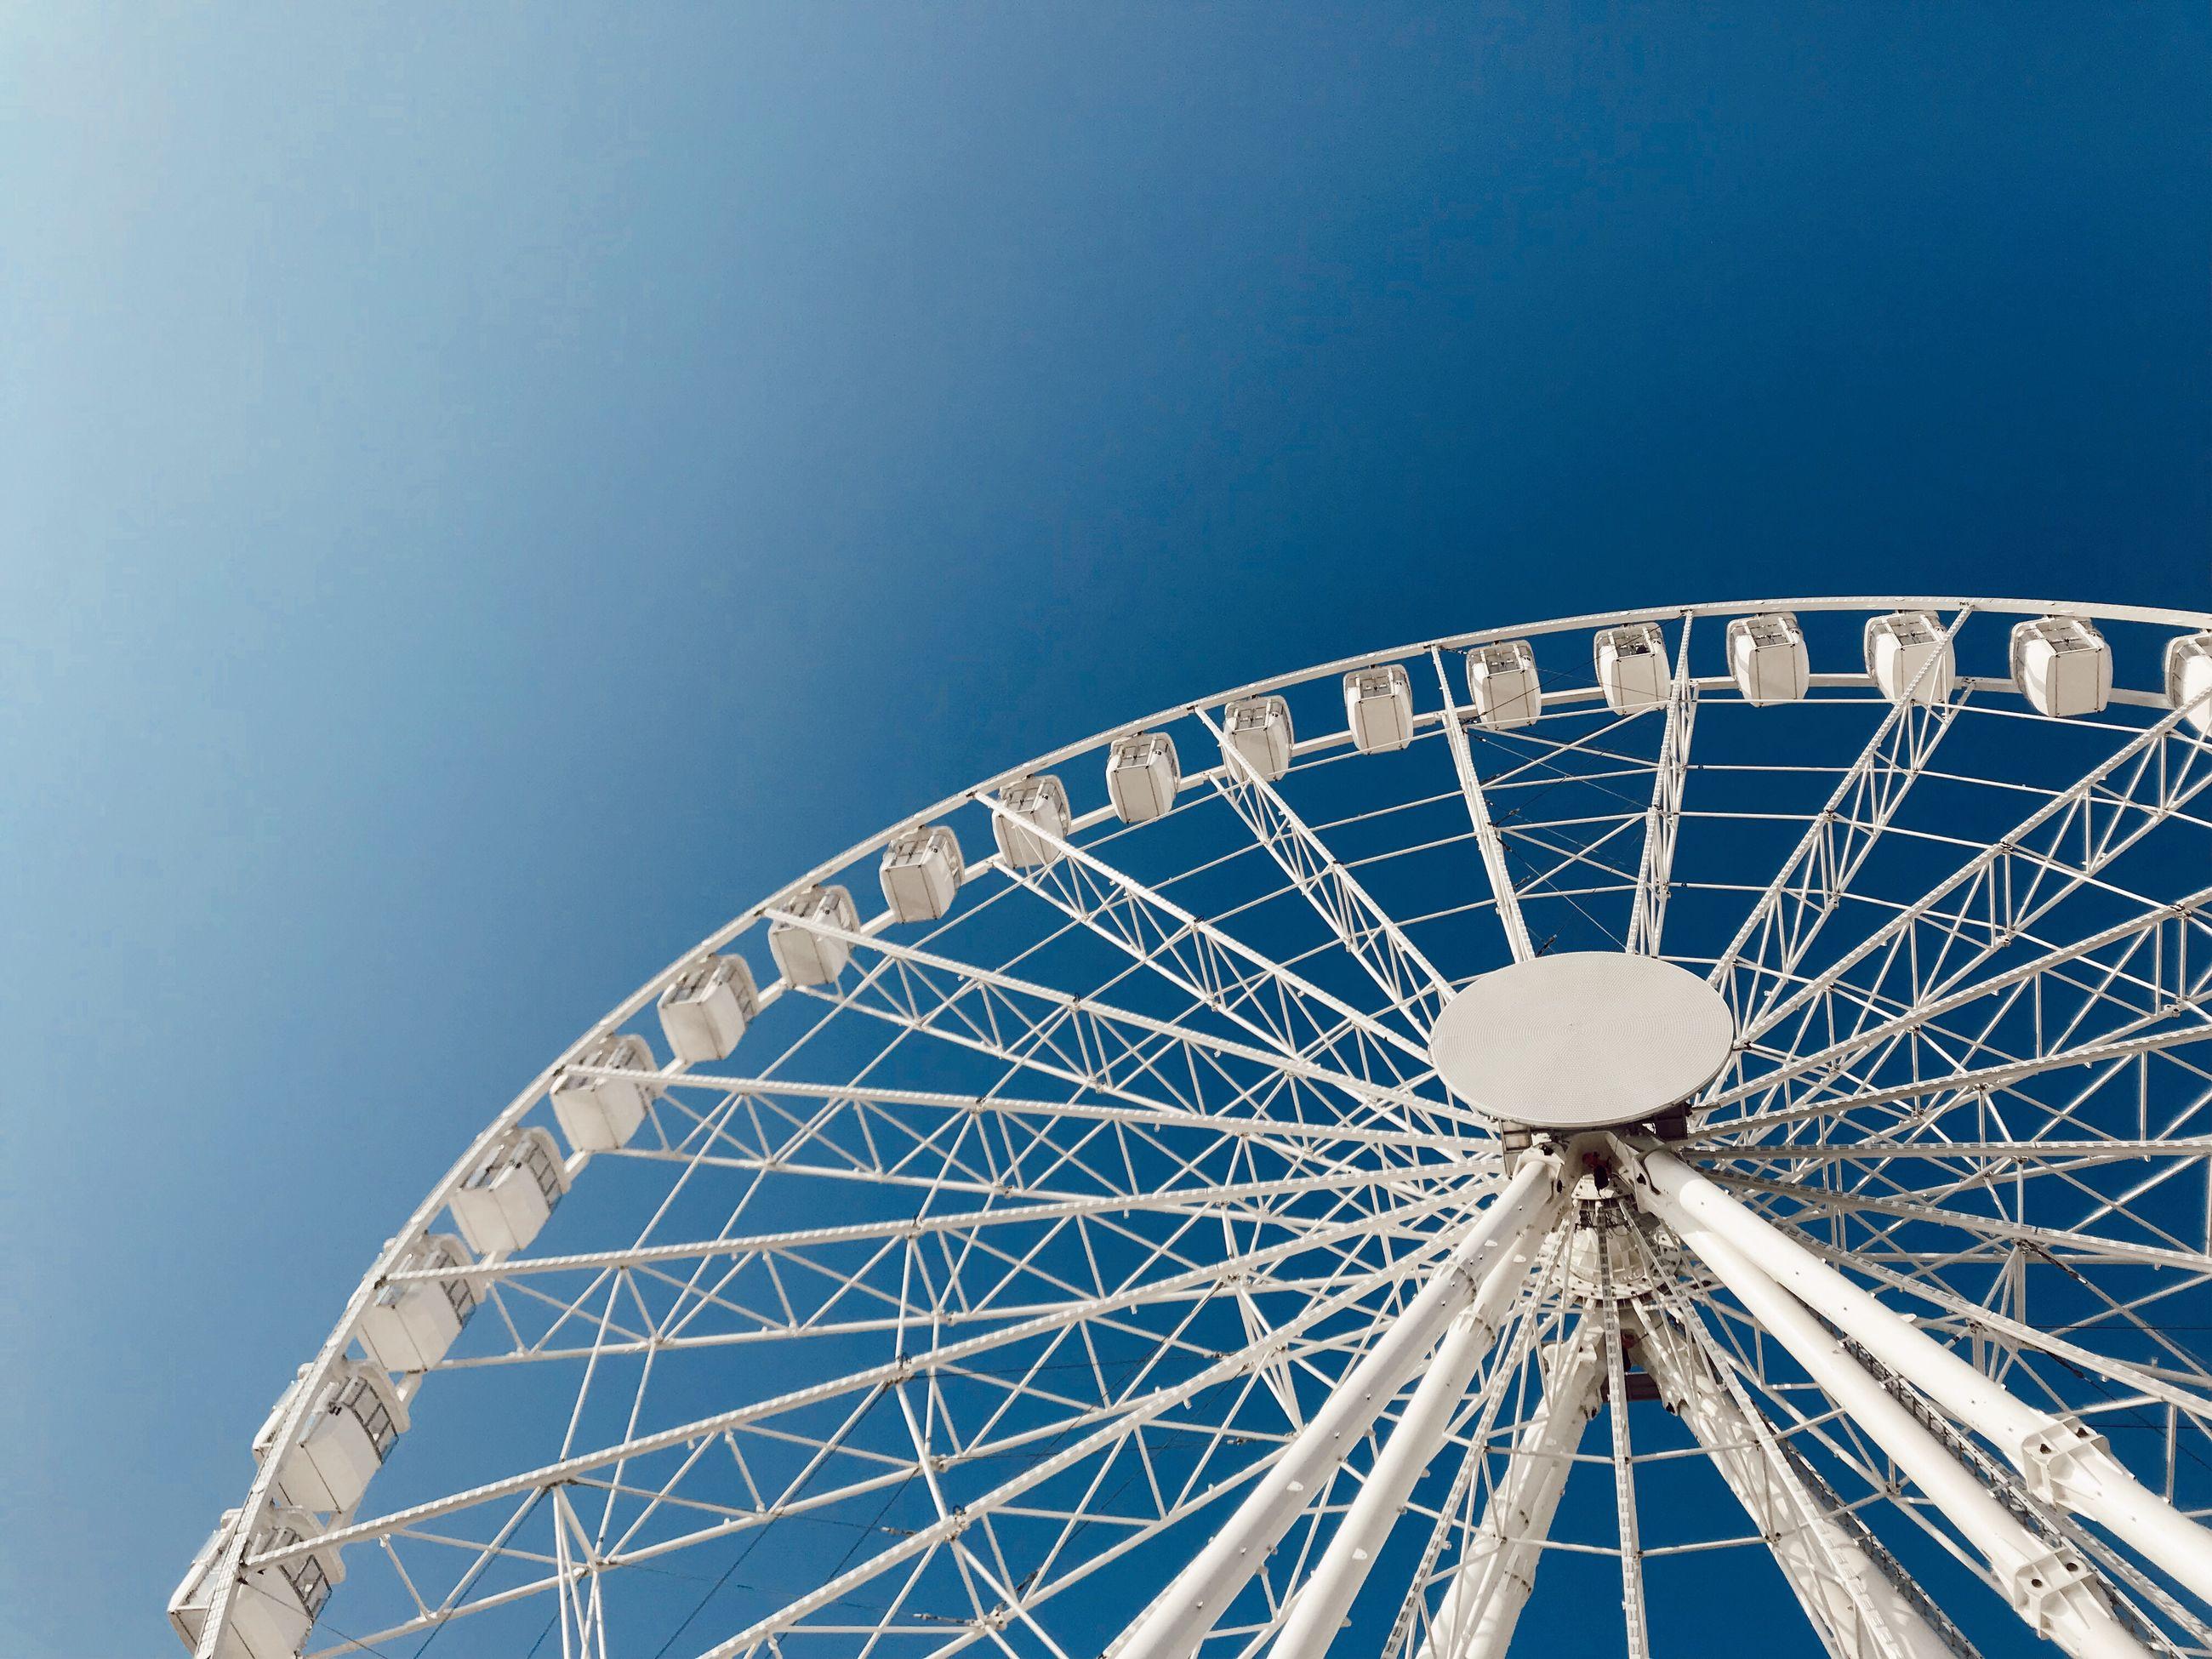 amusement park, amusement park ride, sky, ferris wheel, blue, arts culture and entertainment, clear sky, low angle view, nature, no people, large, fairground, outdoors, leisure activity, copy space, built structure, day, shape, circle, metal